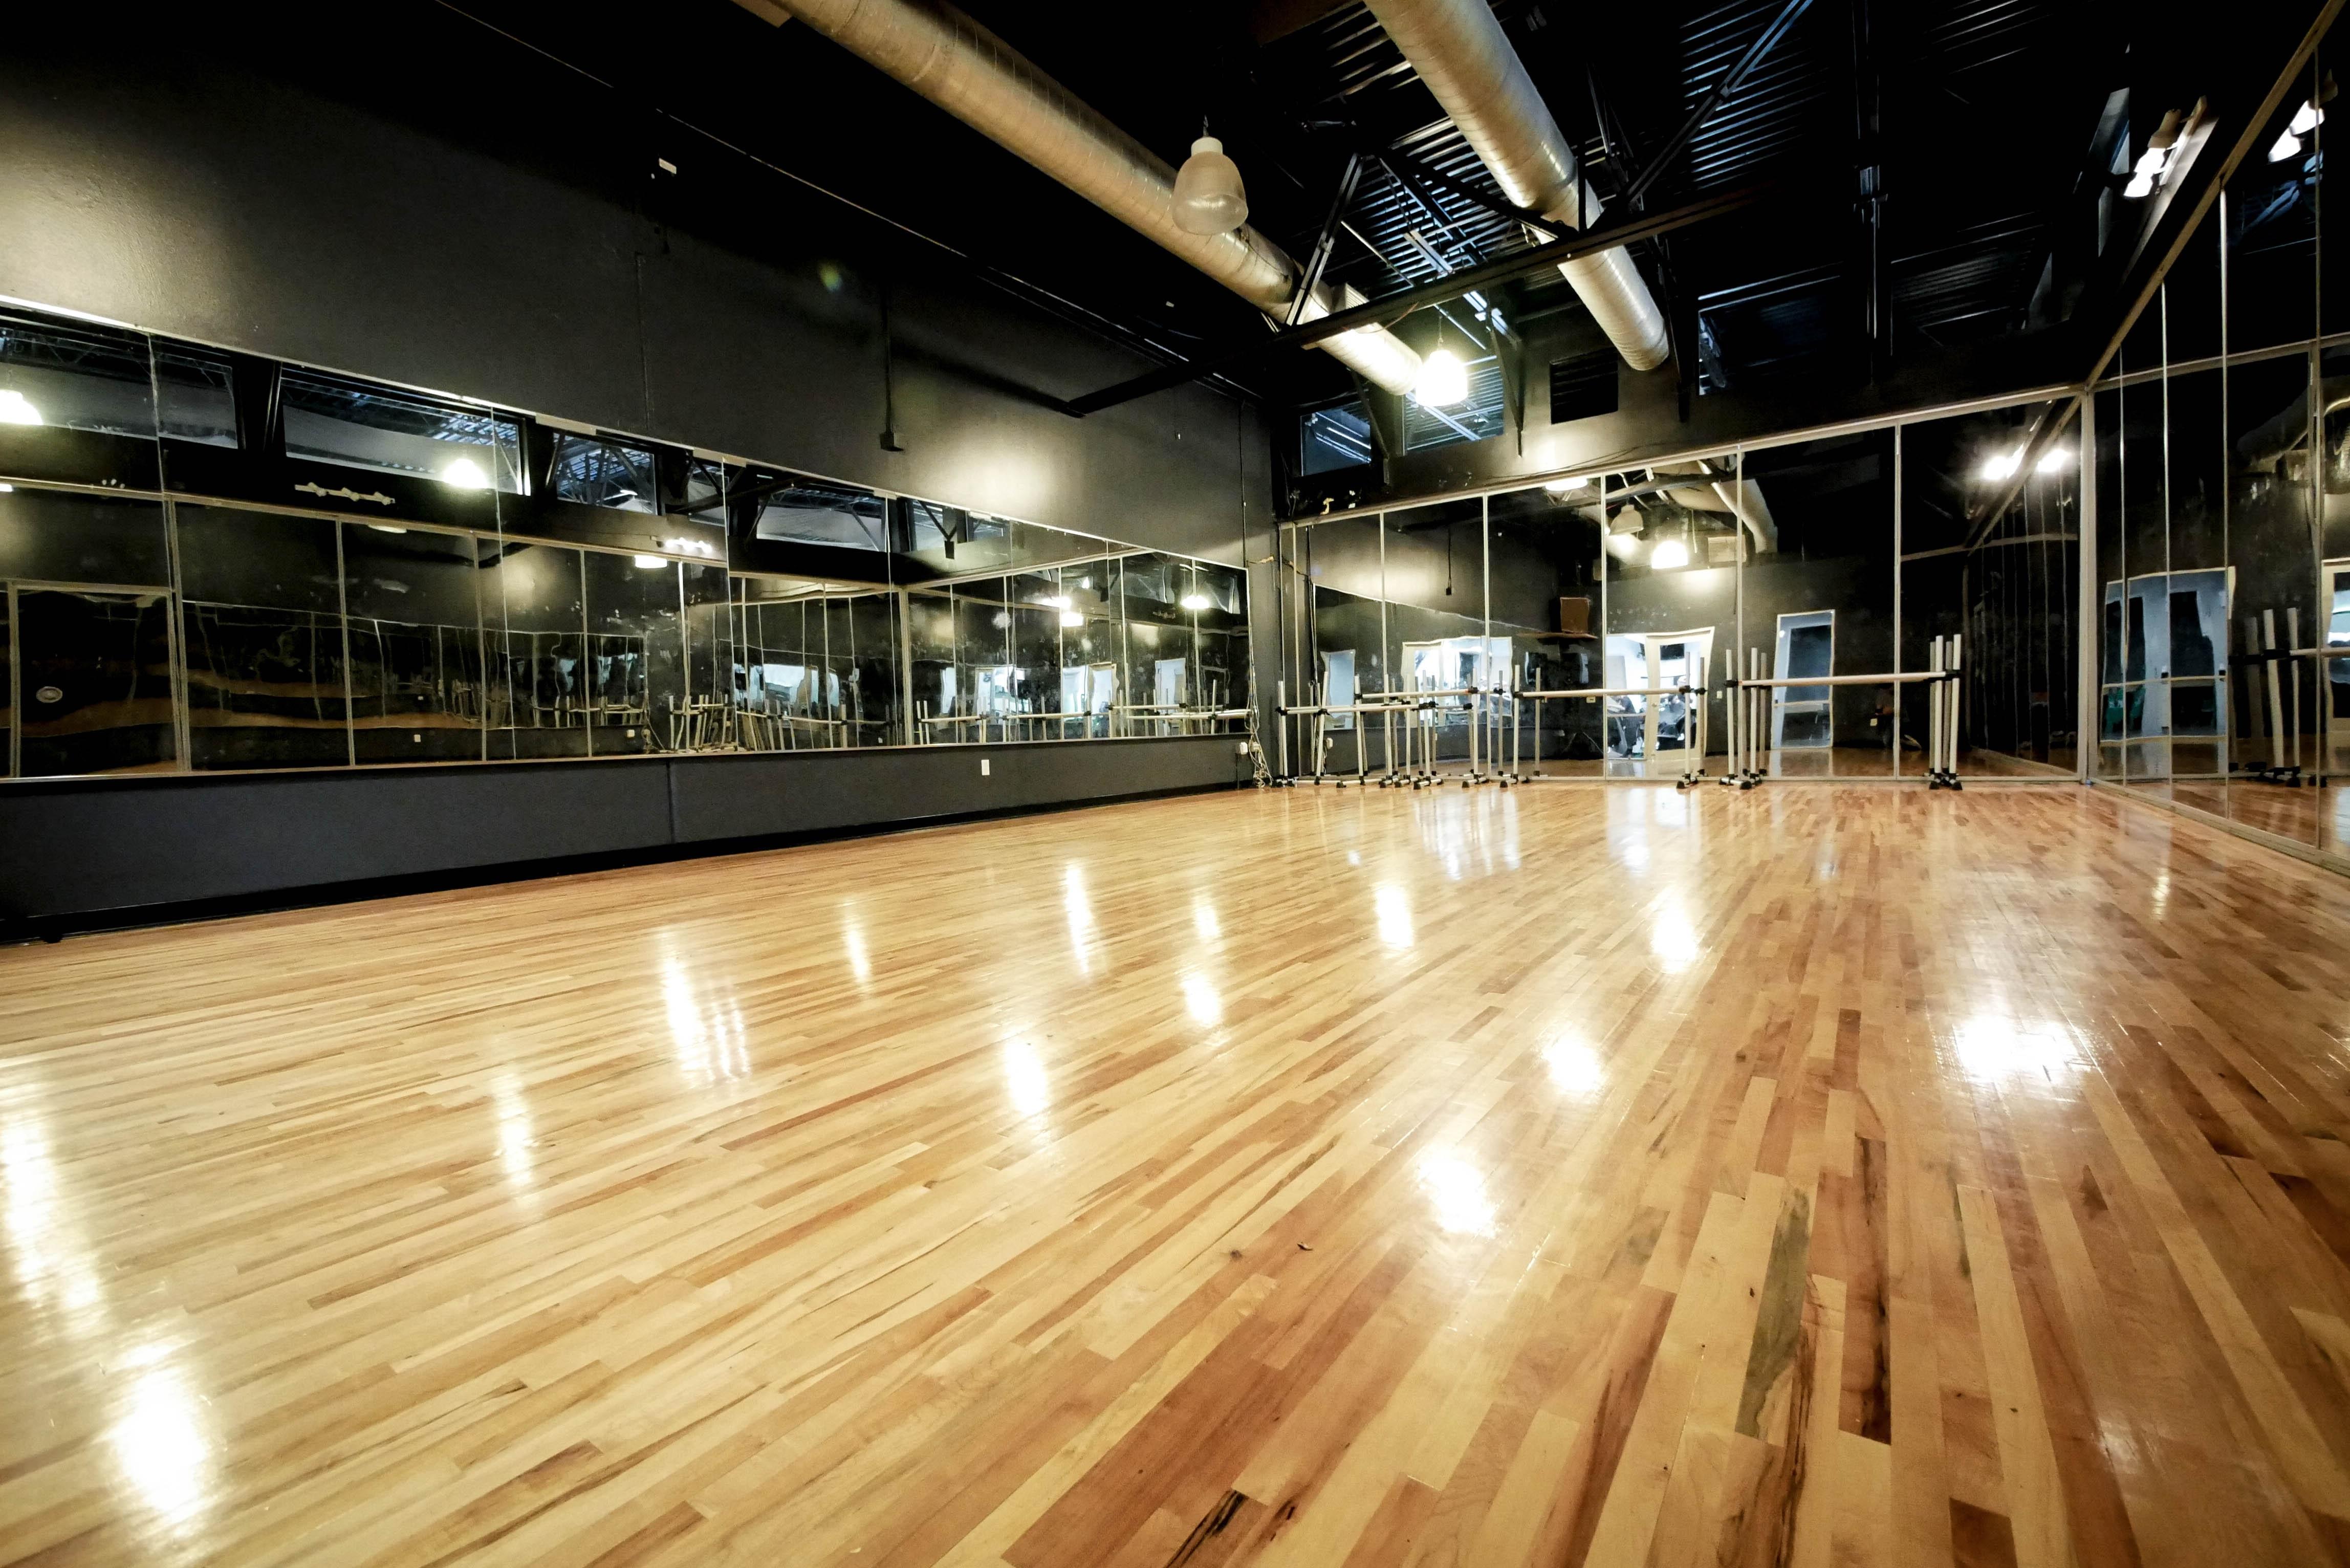 Soundbox Dance Studios